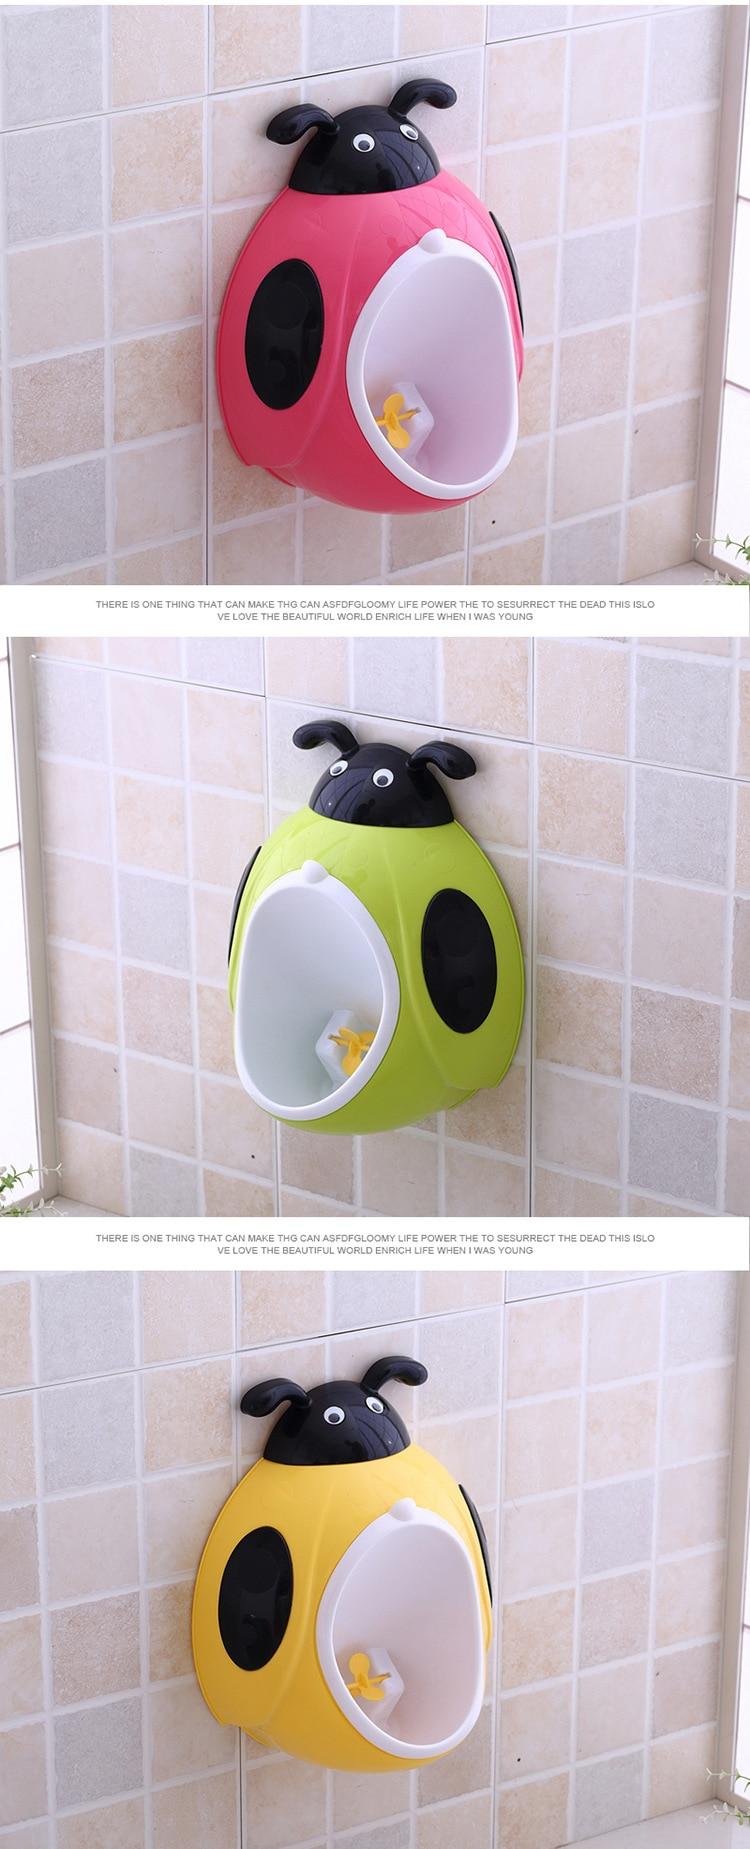 Bathroom love peeing potty toilet